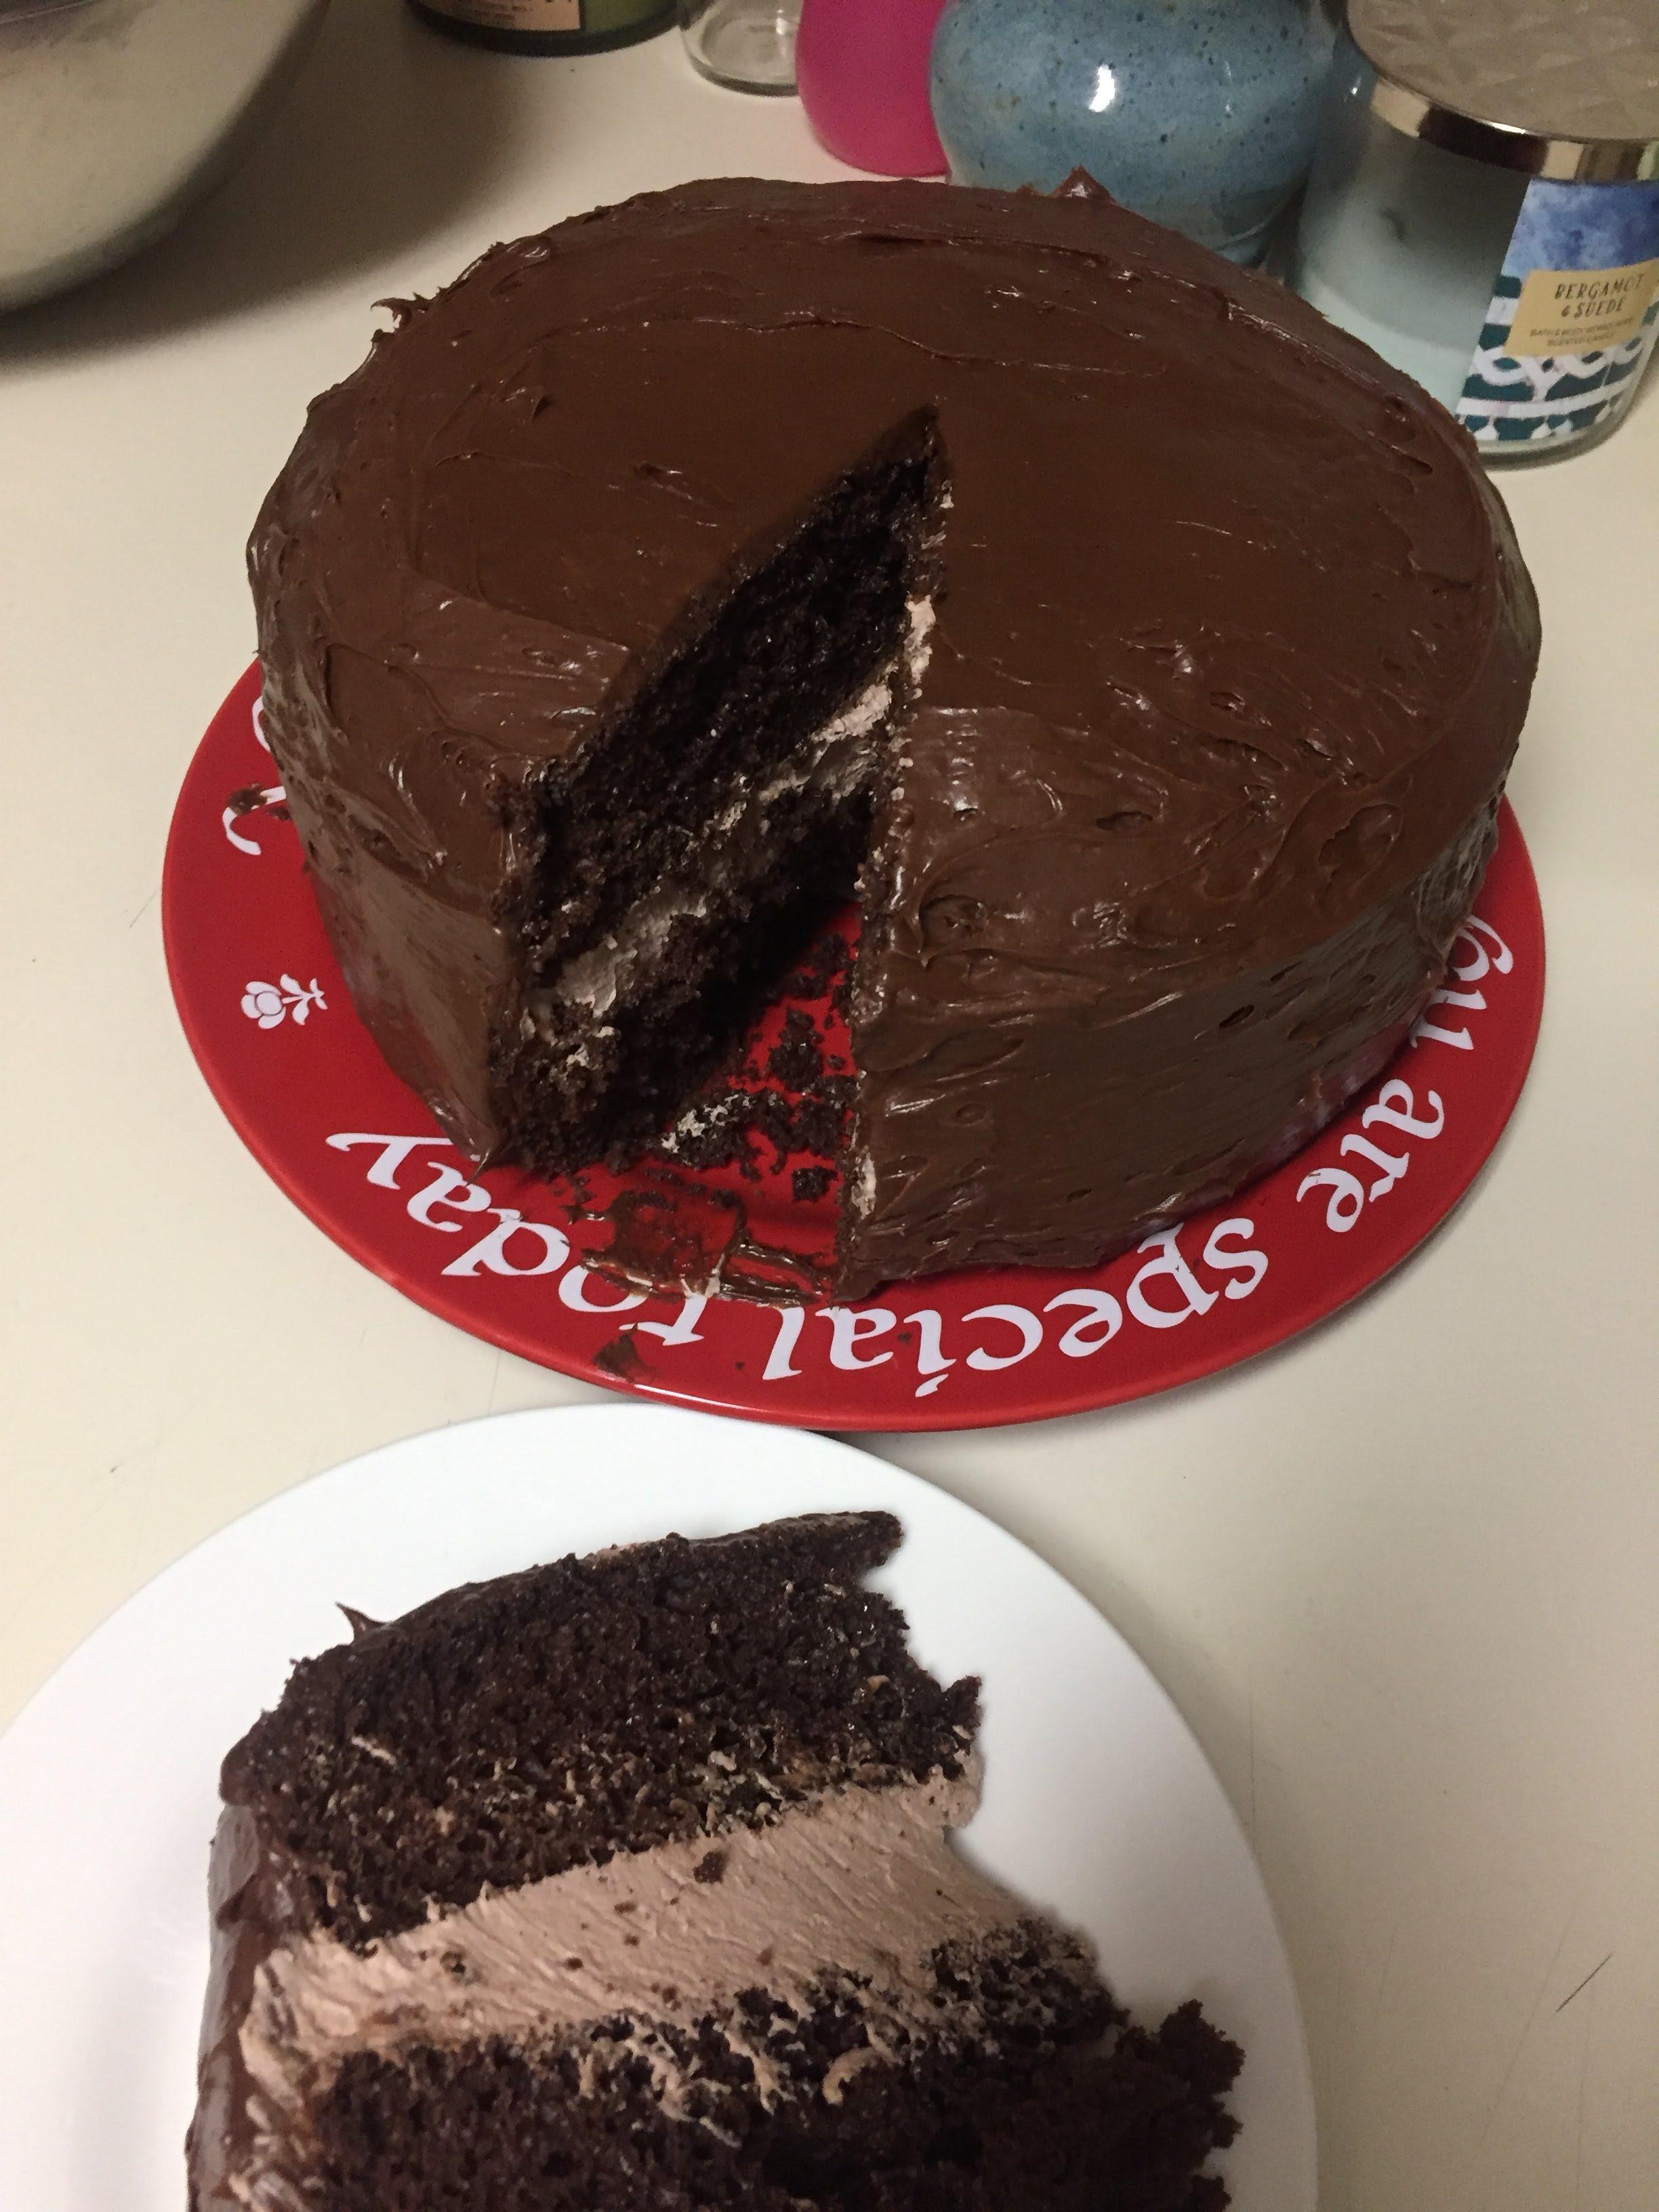 Killer Recipes: Fixed-Up Cake from a Box